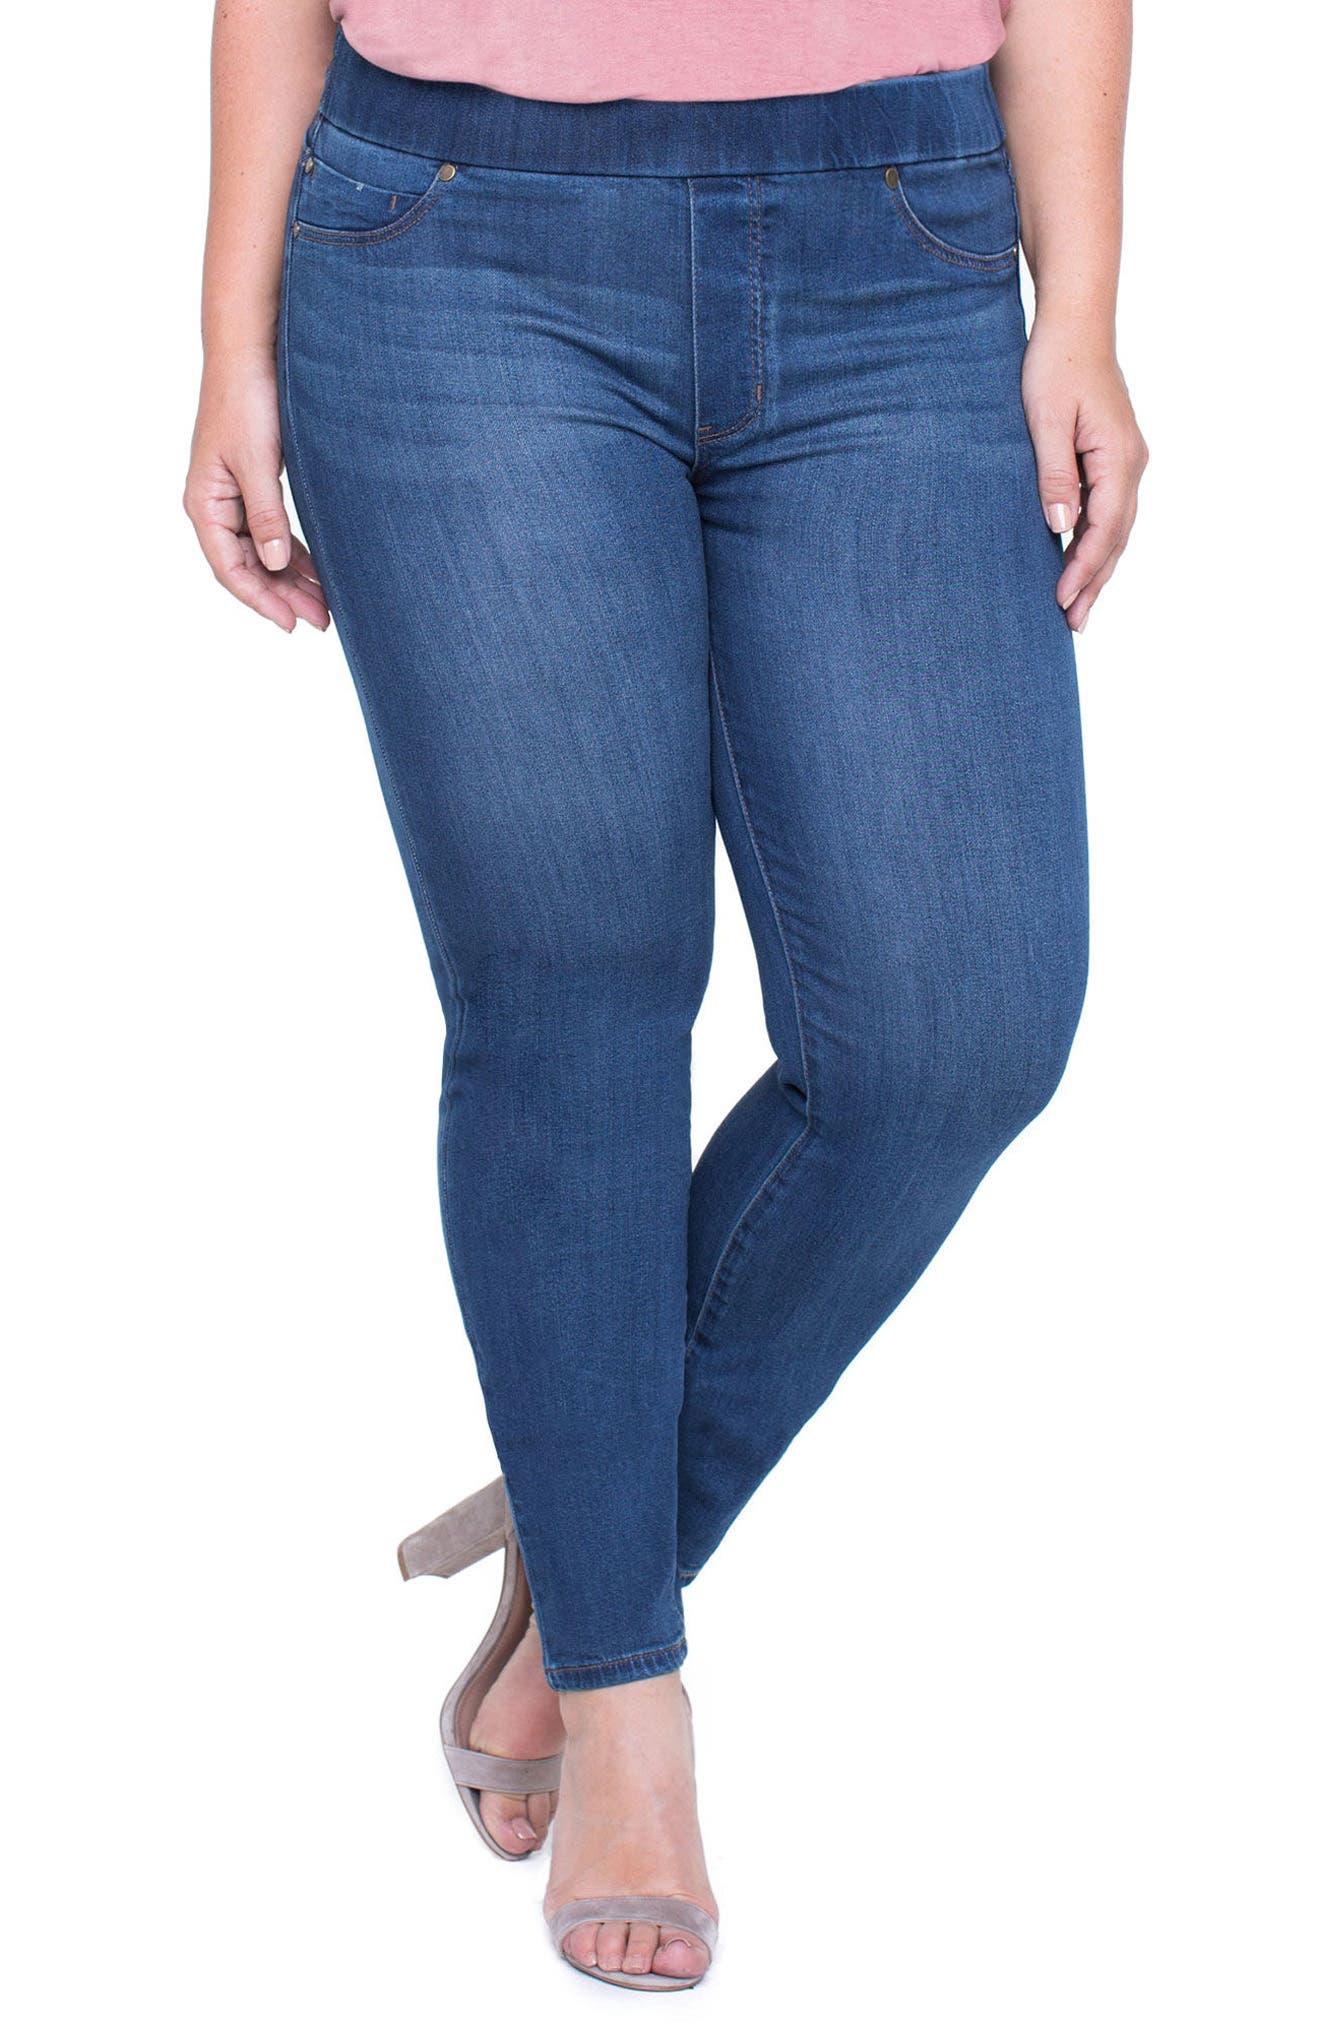 Sienna Knit Denim Leggings,                         Main,                         color, Petrol Was